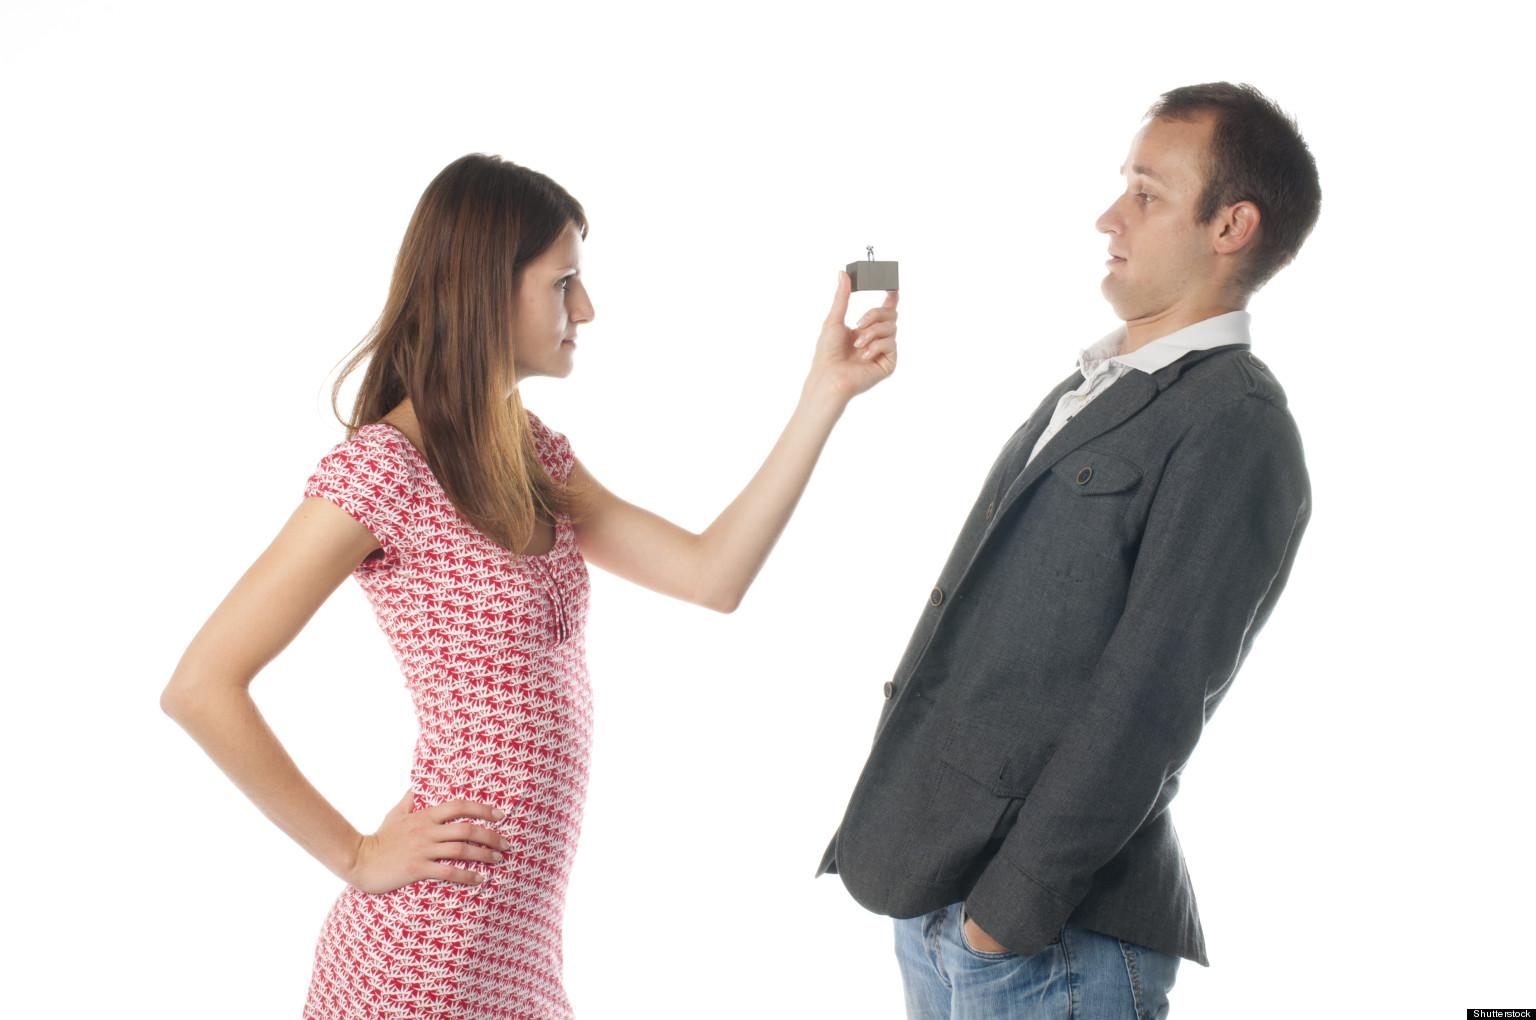 o-MARRIAGE-PROPOSALS-facebook